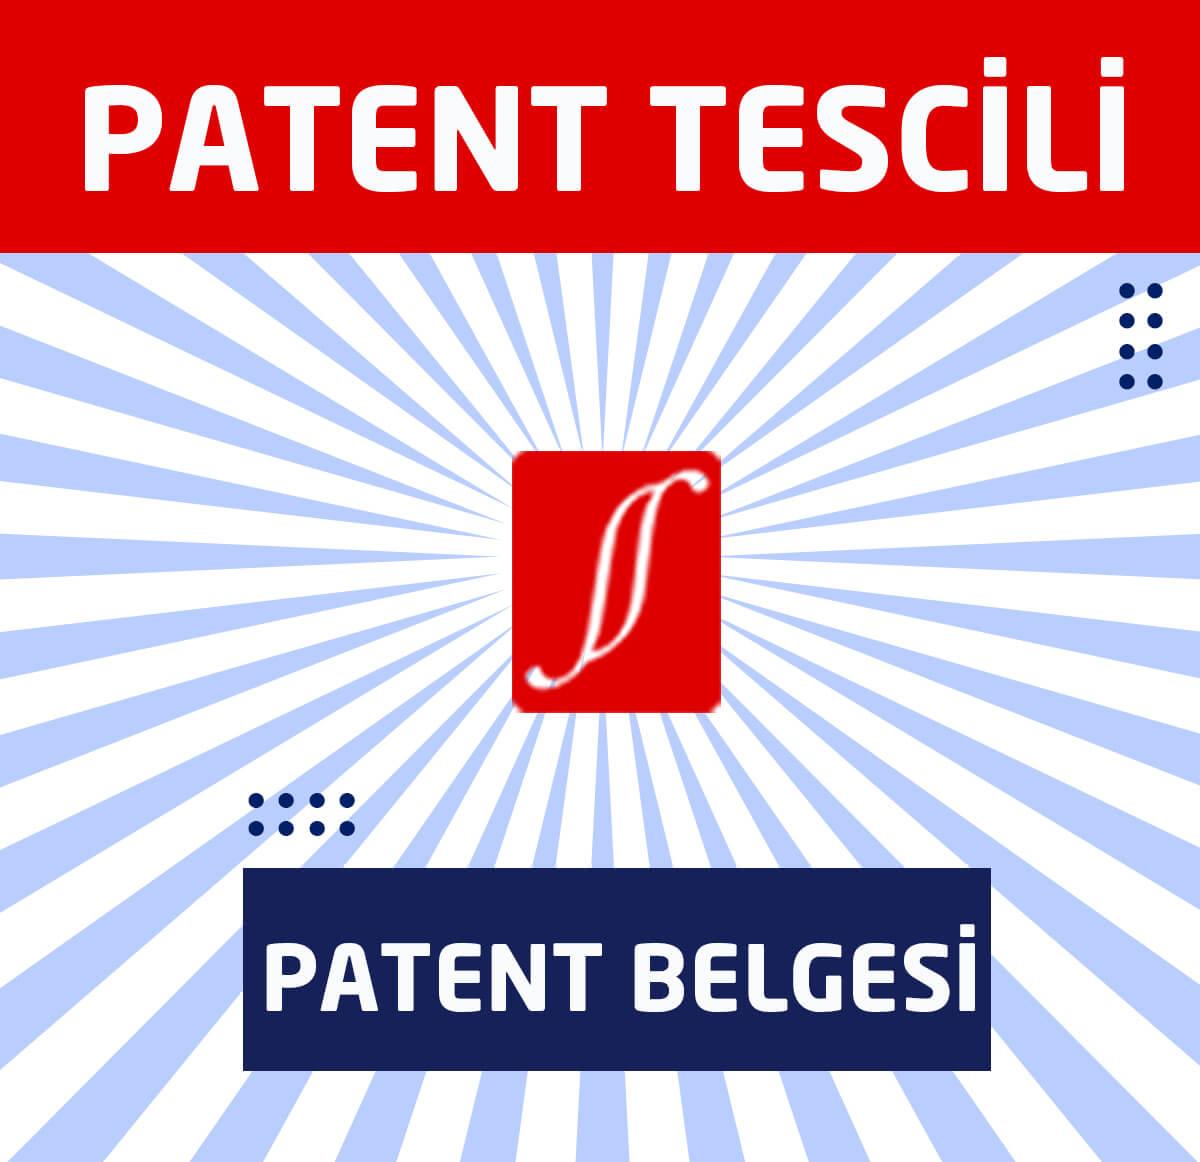 patent tescili nedir